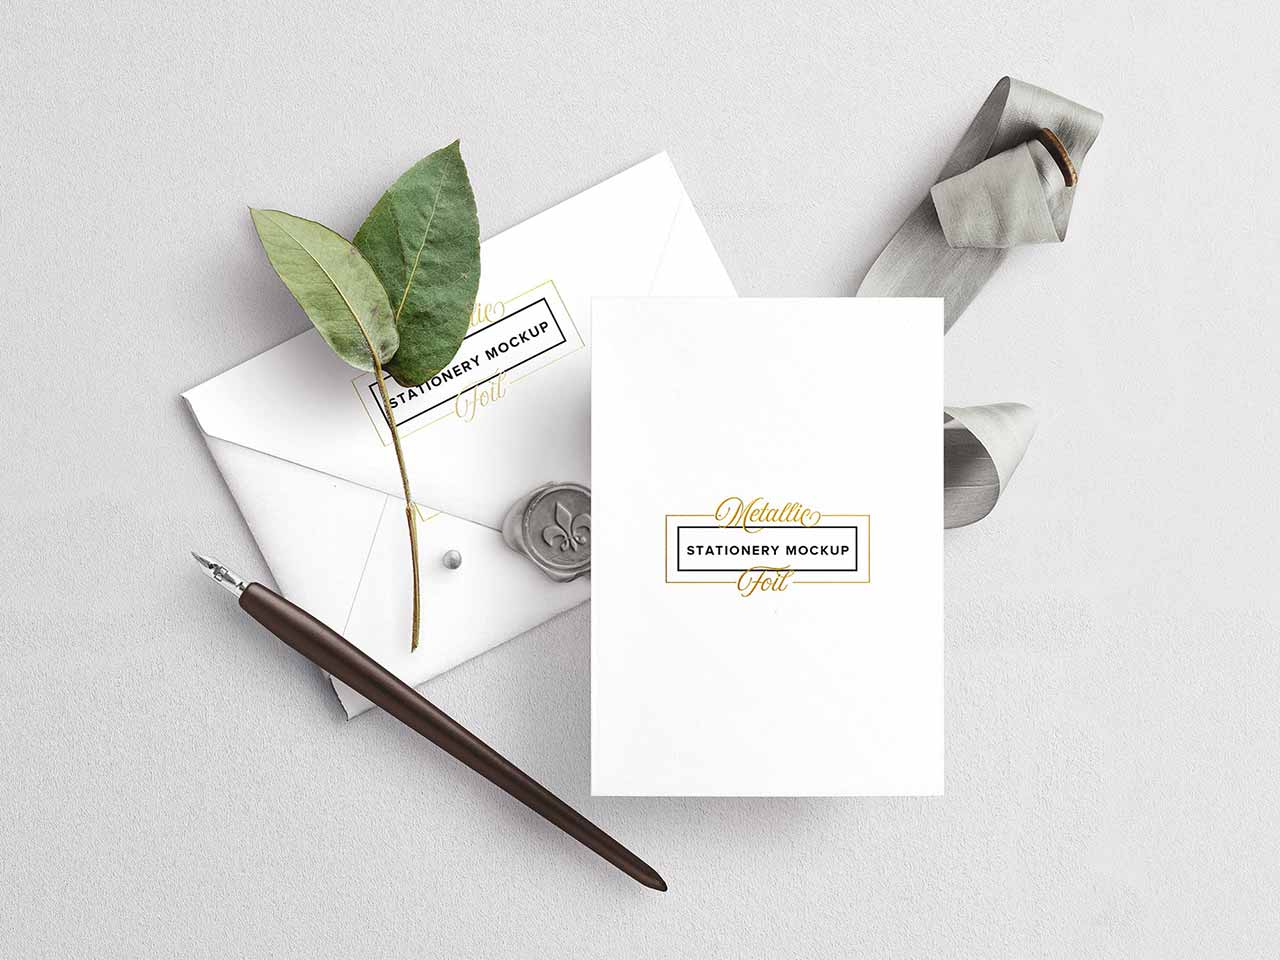 Wedding Stationery Mockup Set